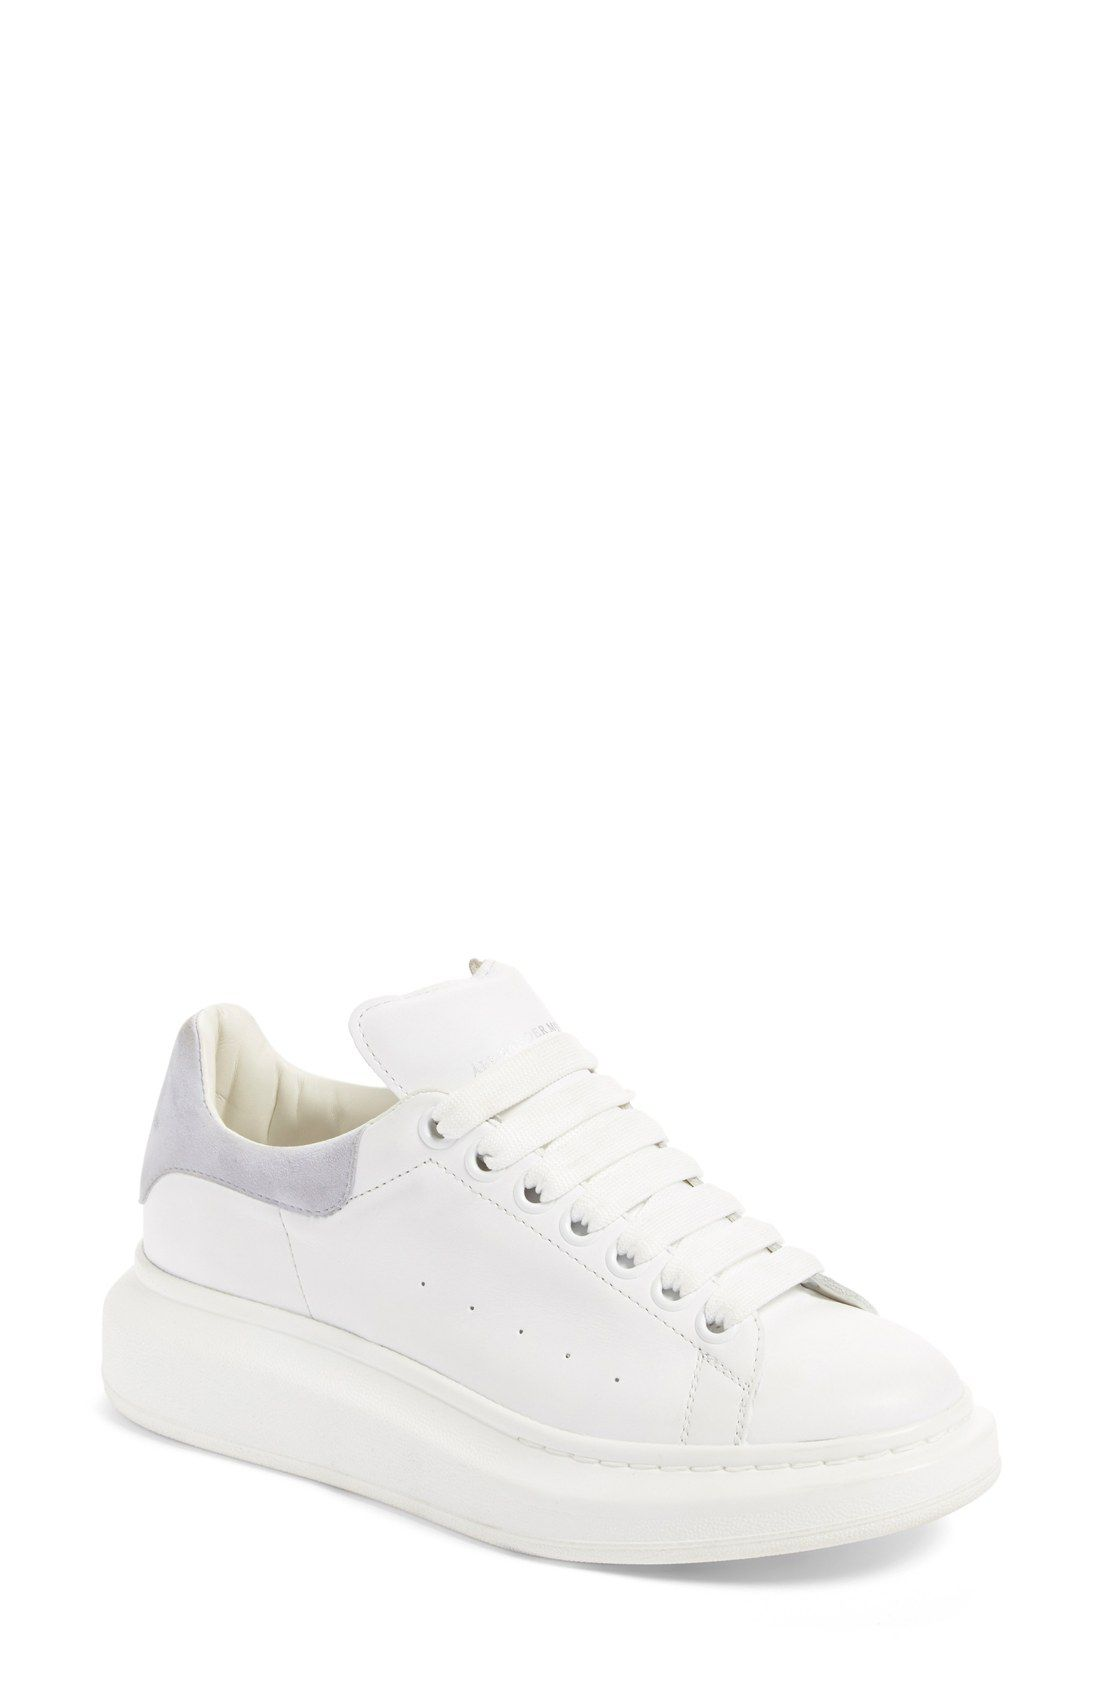 062fb9ad395 Alexander McQueen Sneaker (Women) Alexander Mcqueen Sneakers Women, Purse  Styles, Adidas Stan